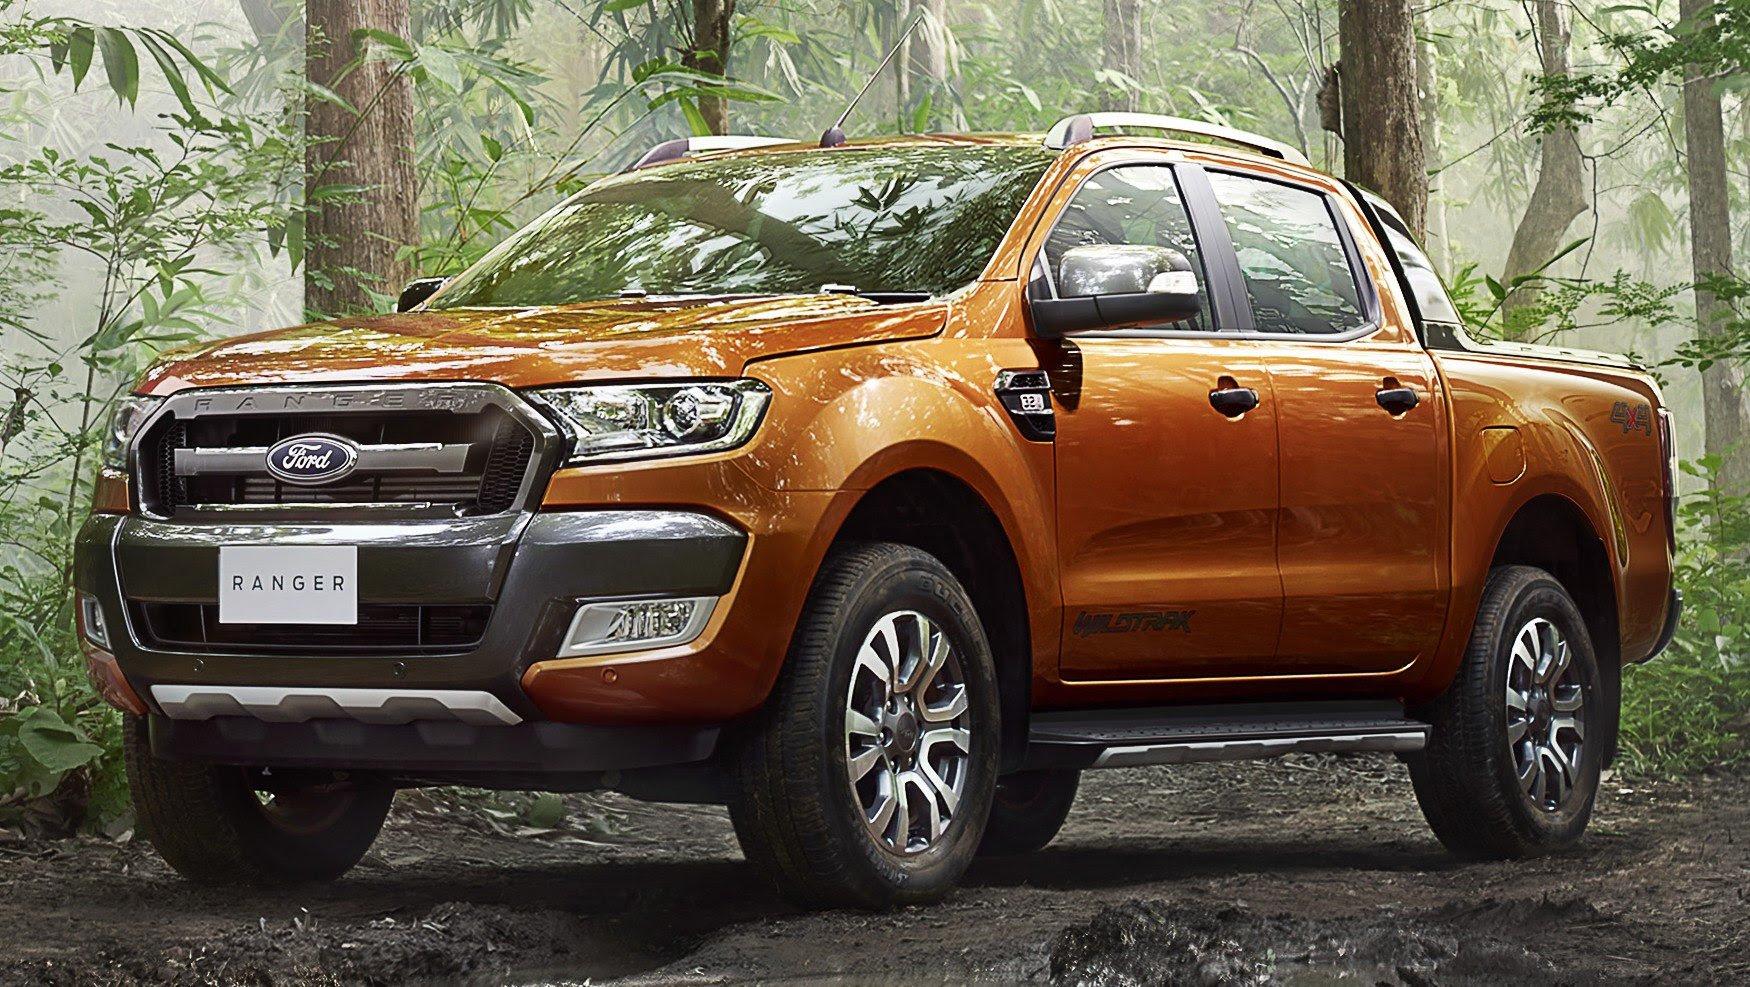 Ford Ranger Raptor to enter production in 2019?